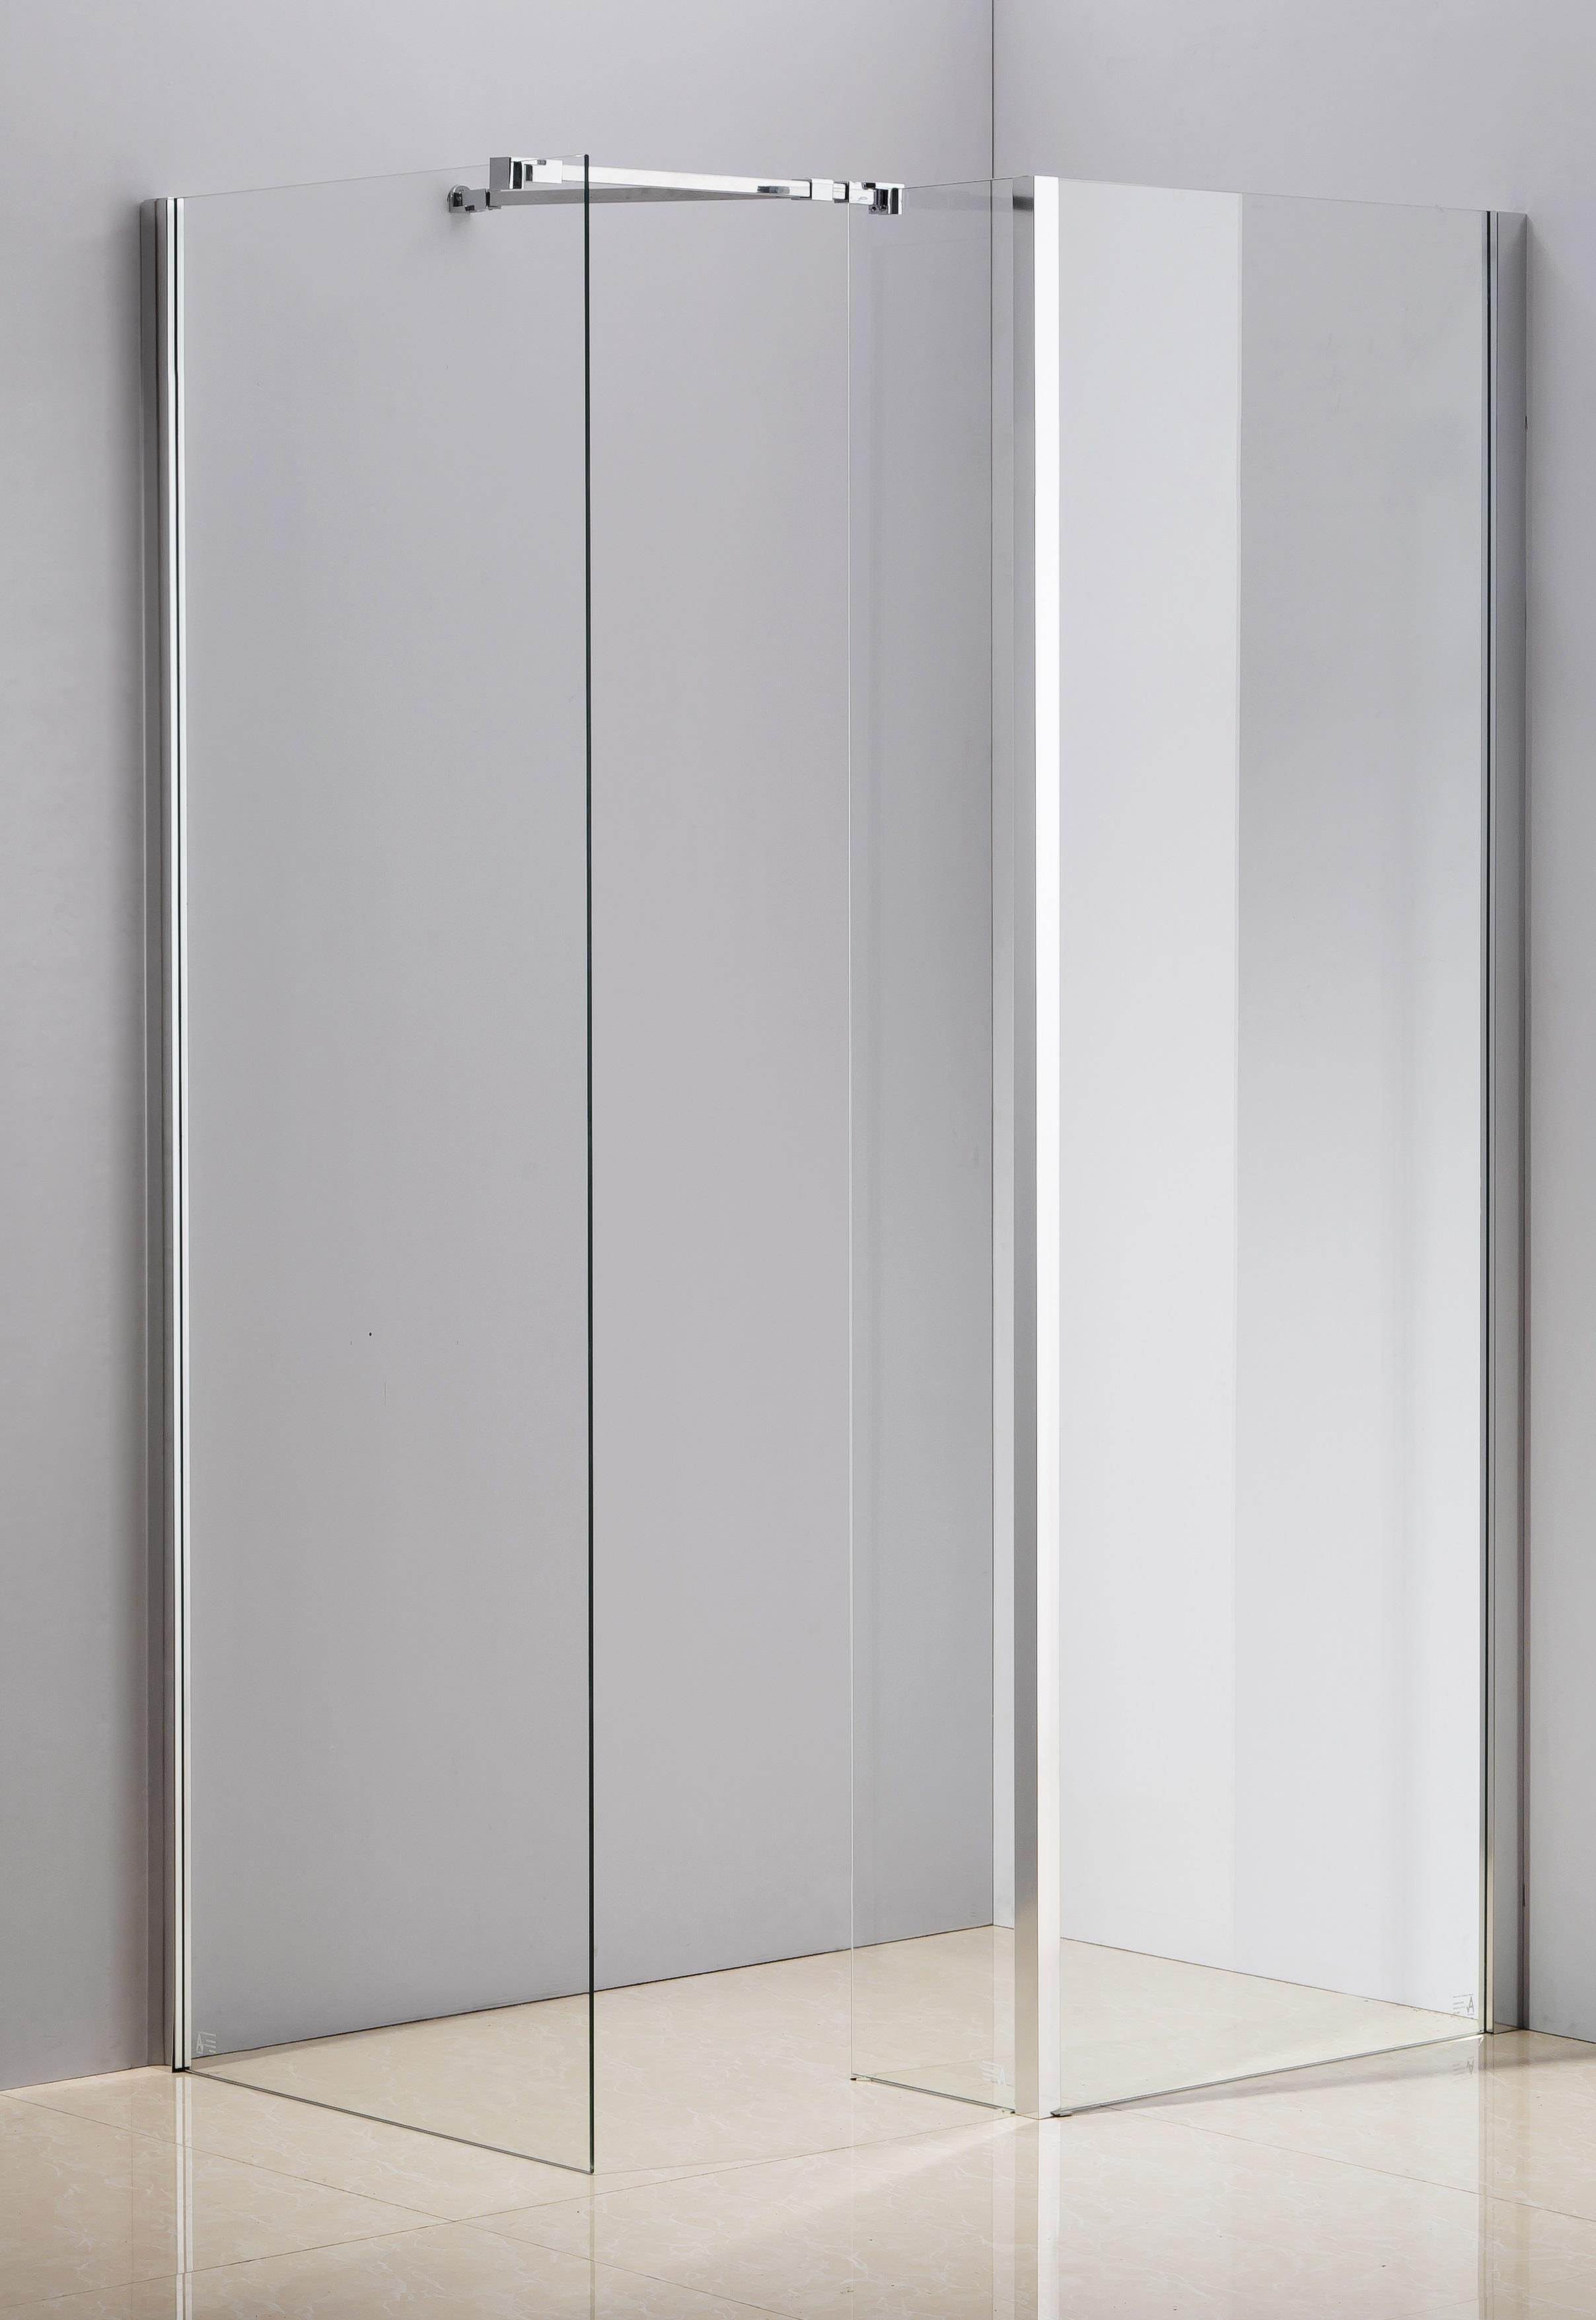 1200x800mm Walk in Shower Enclosure Safety Glass Shower By Della Francesca  Z2678